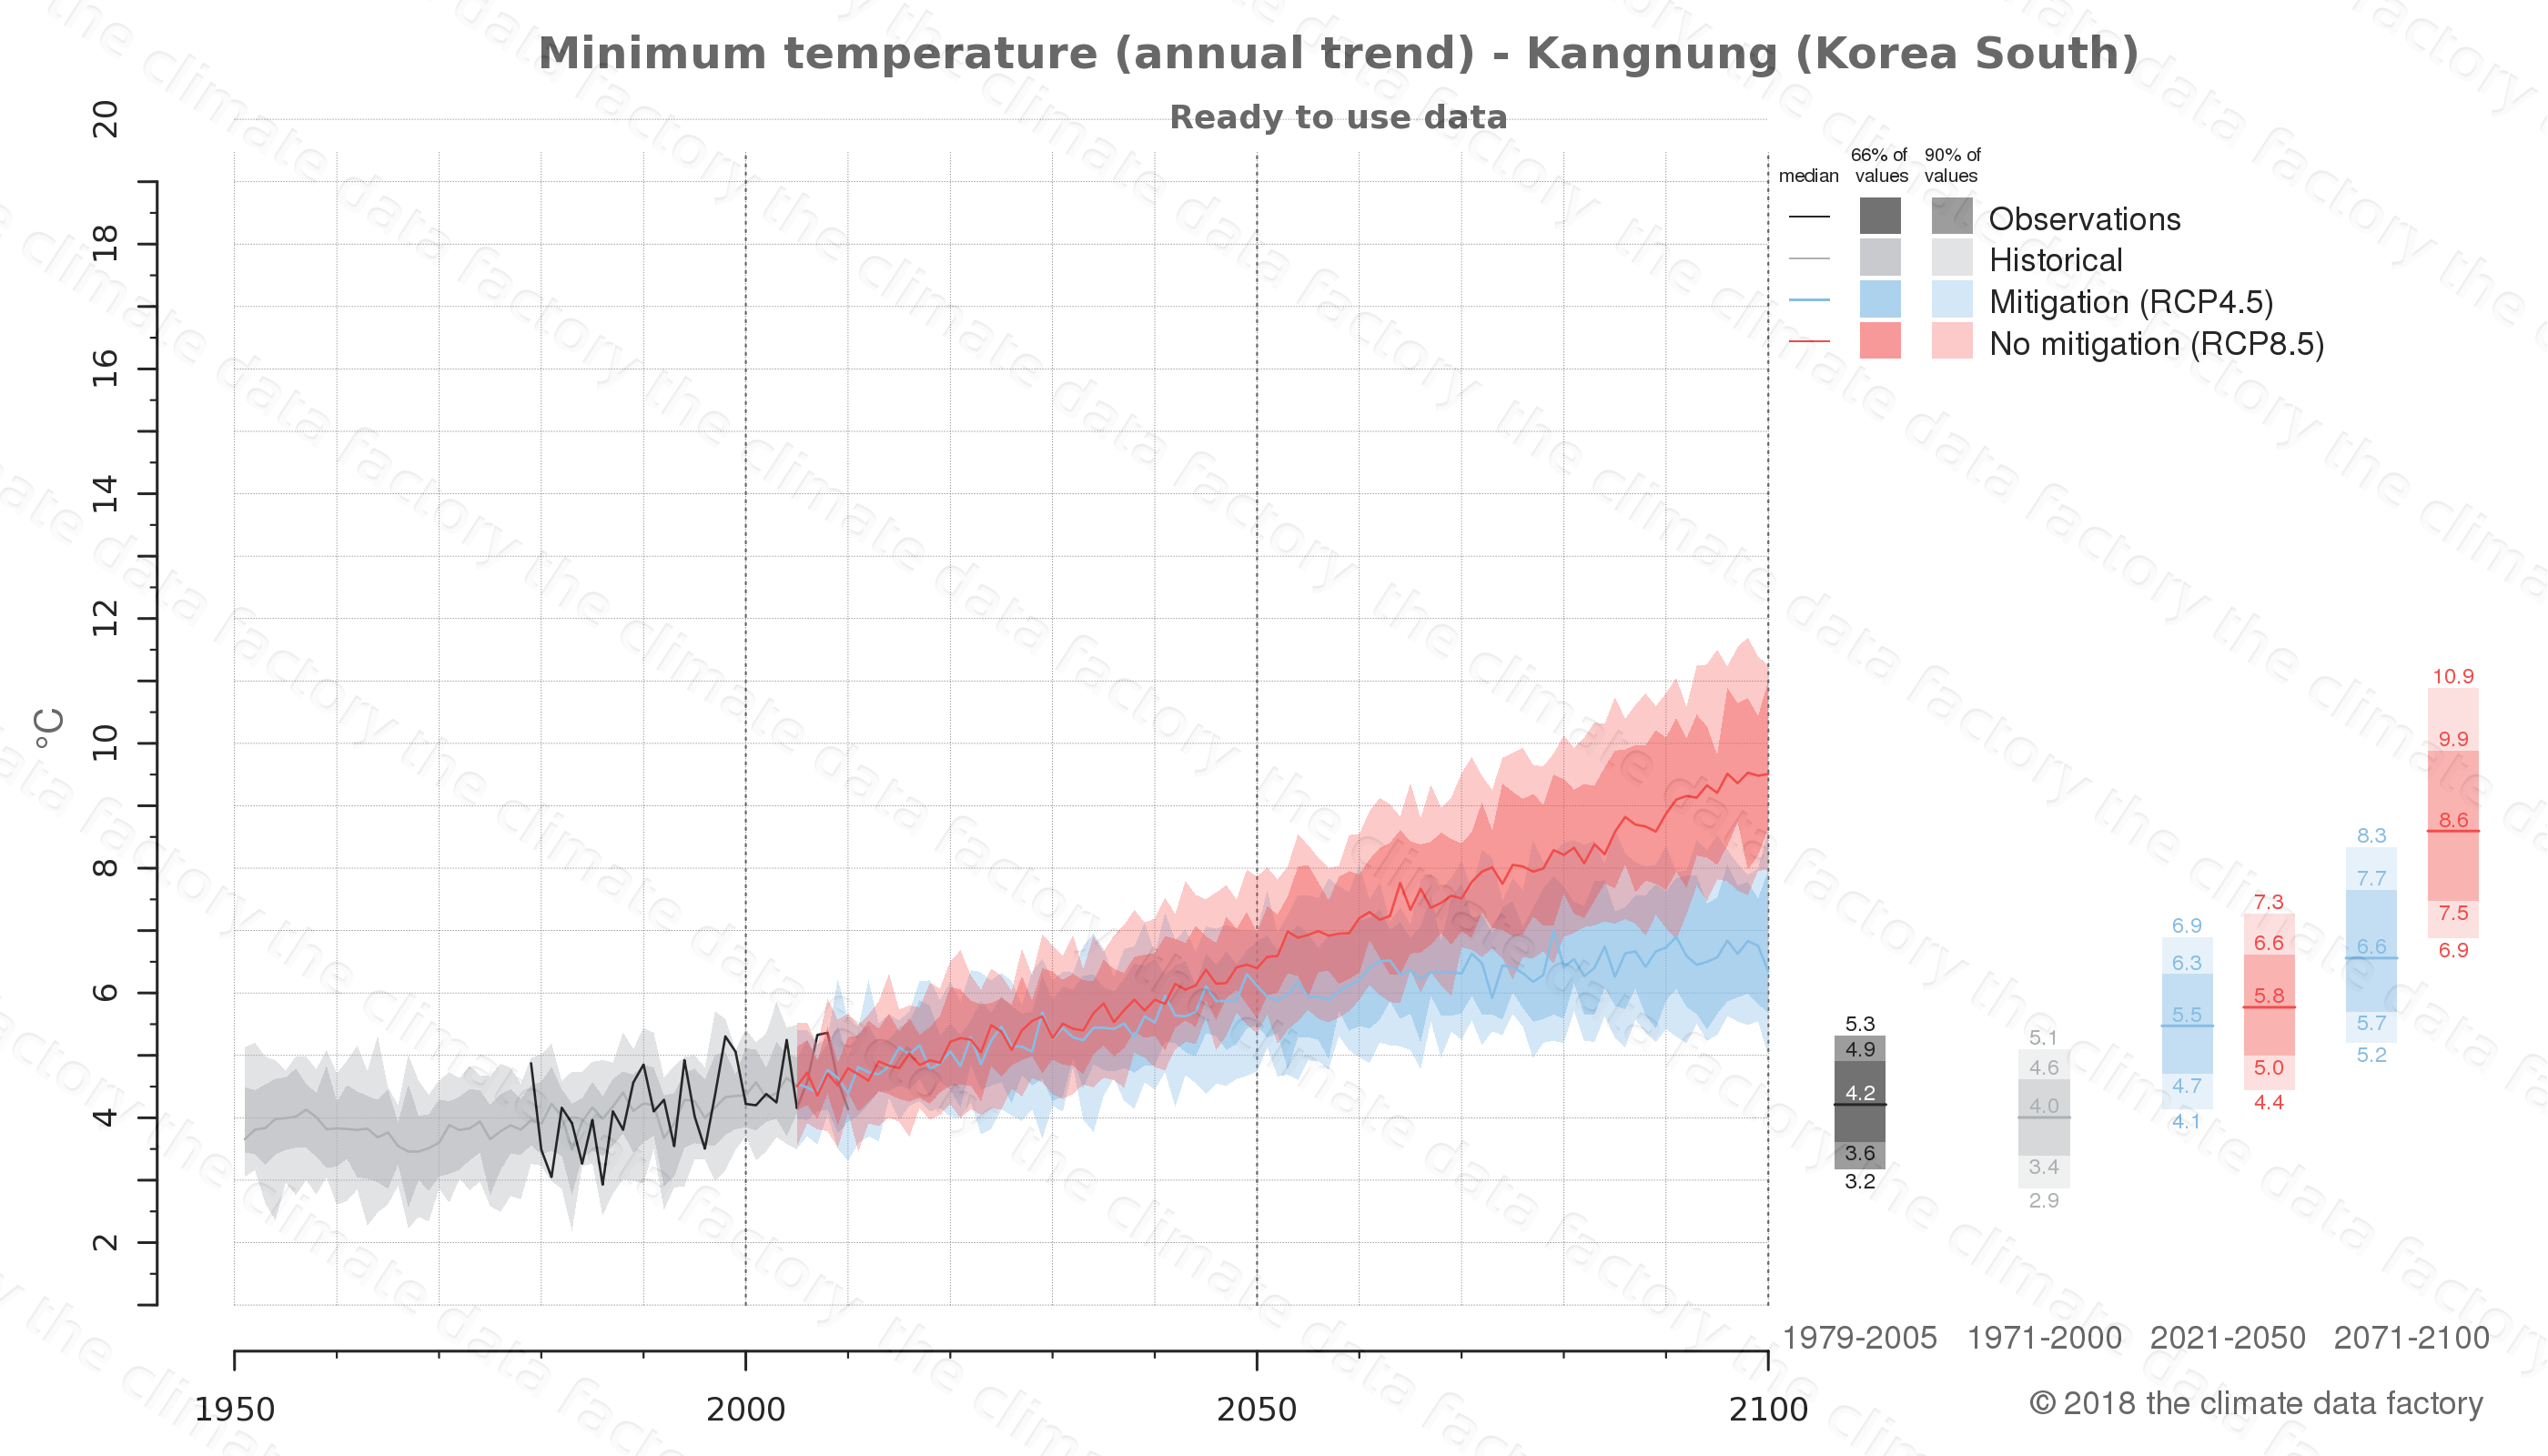 climate change data policy adaptation climate graph city data minimum-temperature kangnung south korea